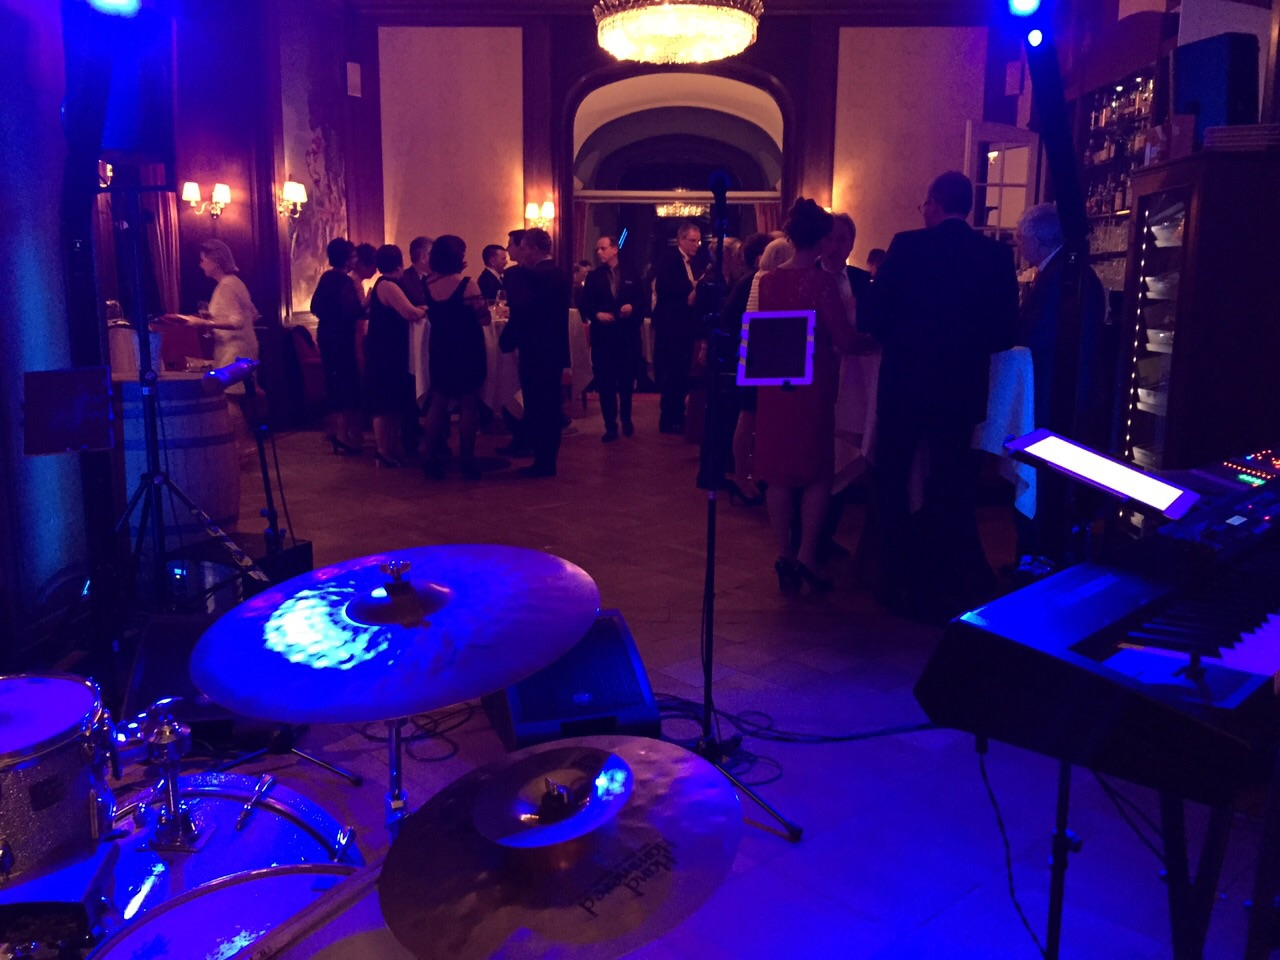 Liveband_Jazzband_Geburtstag